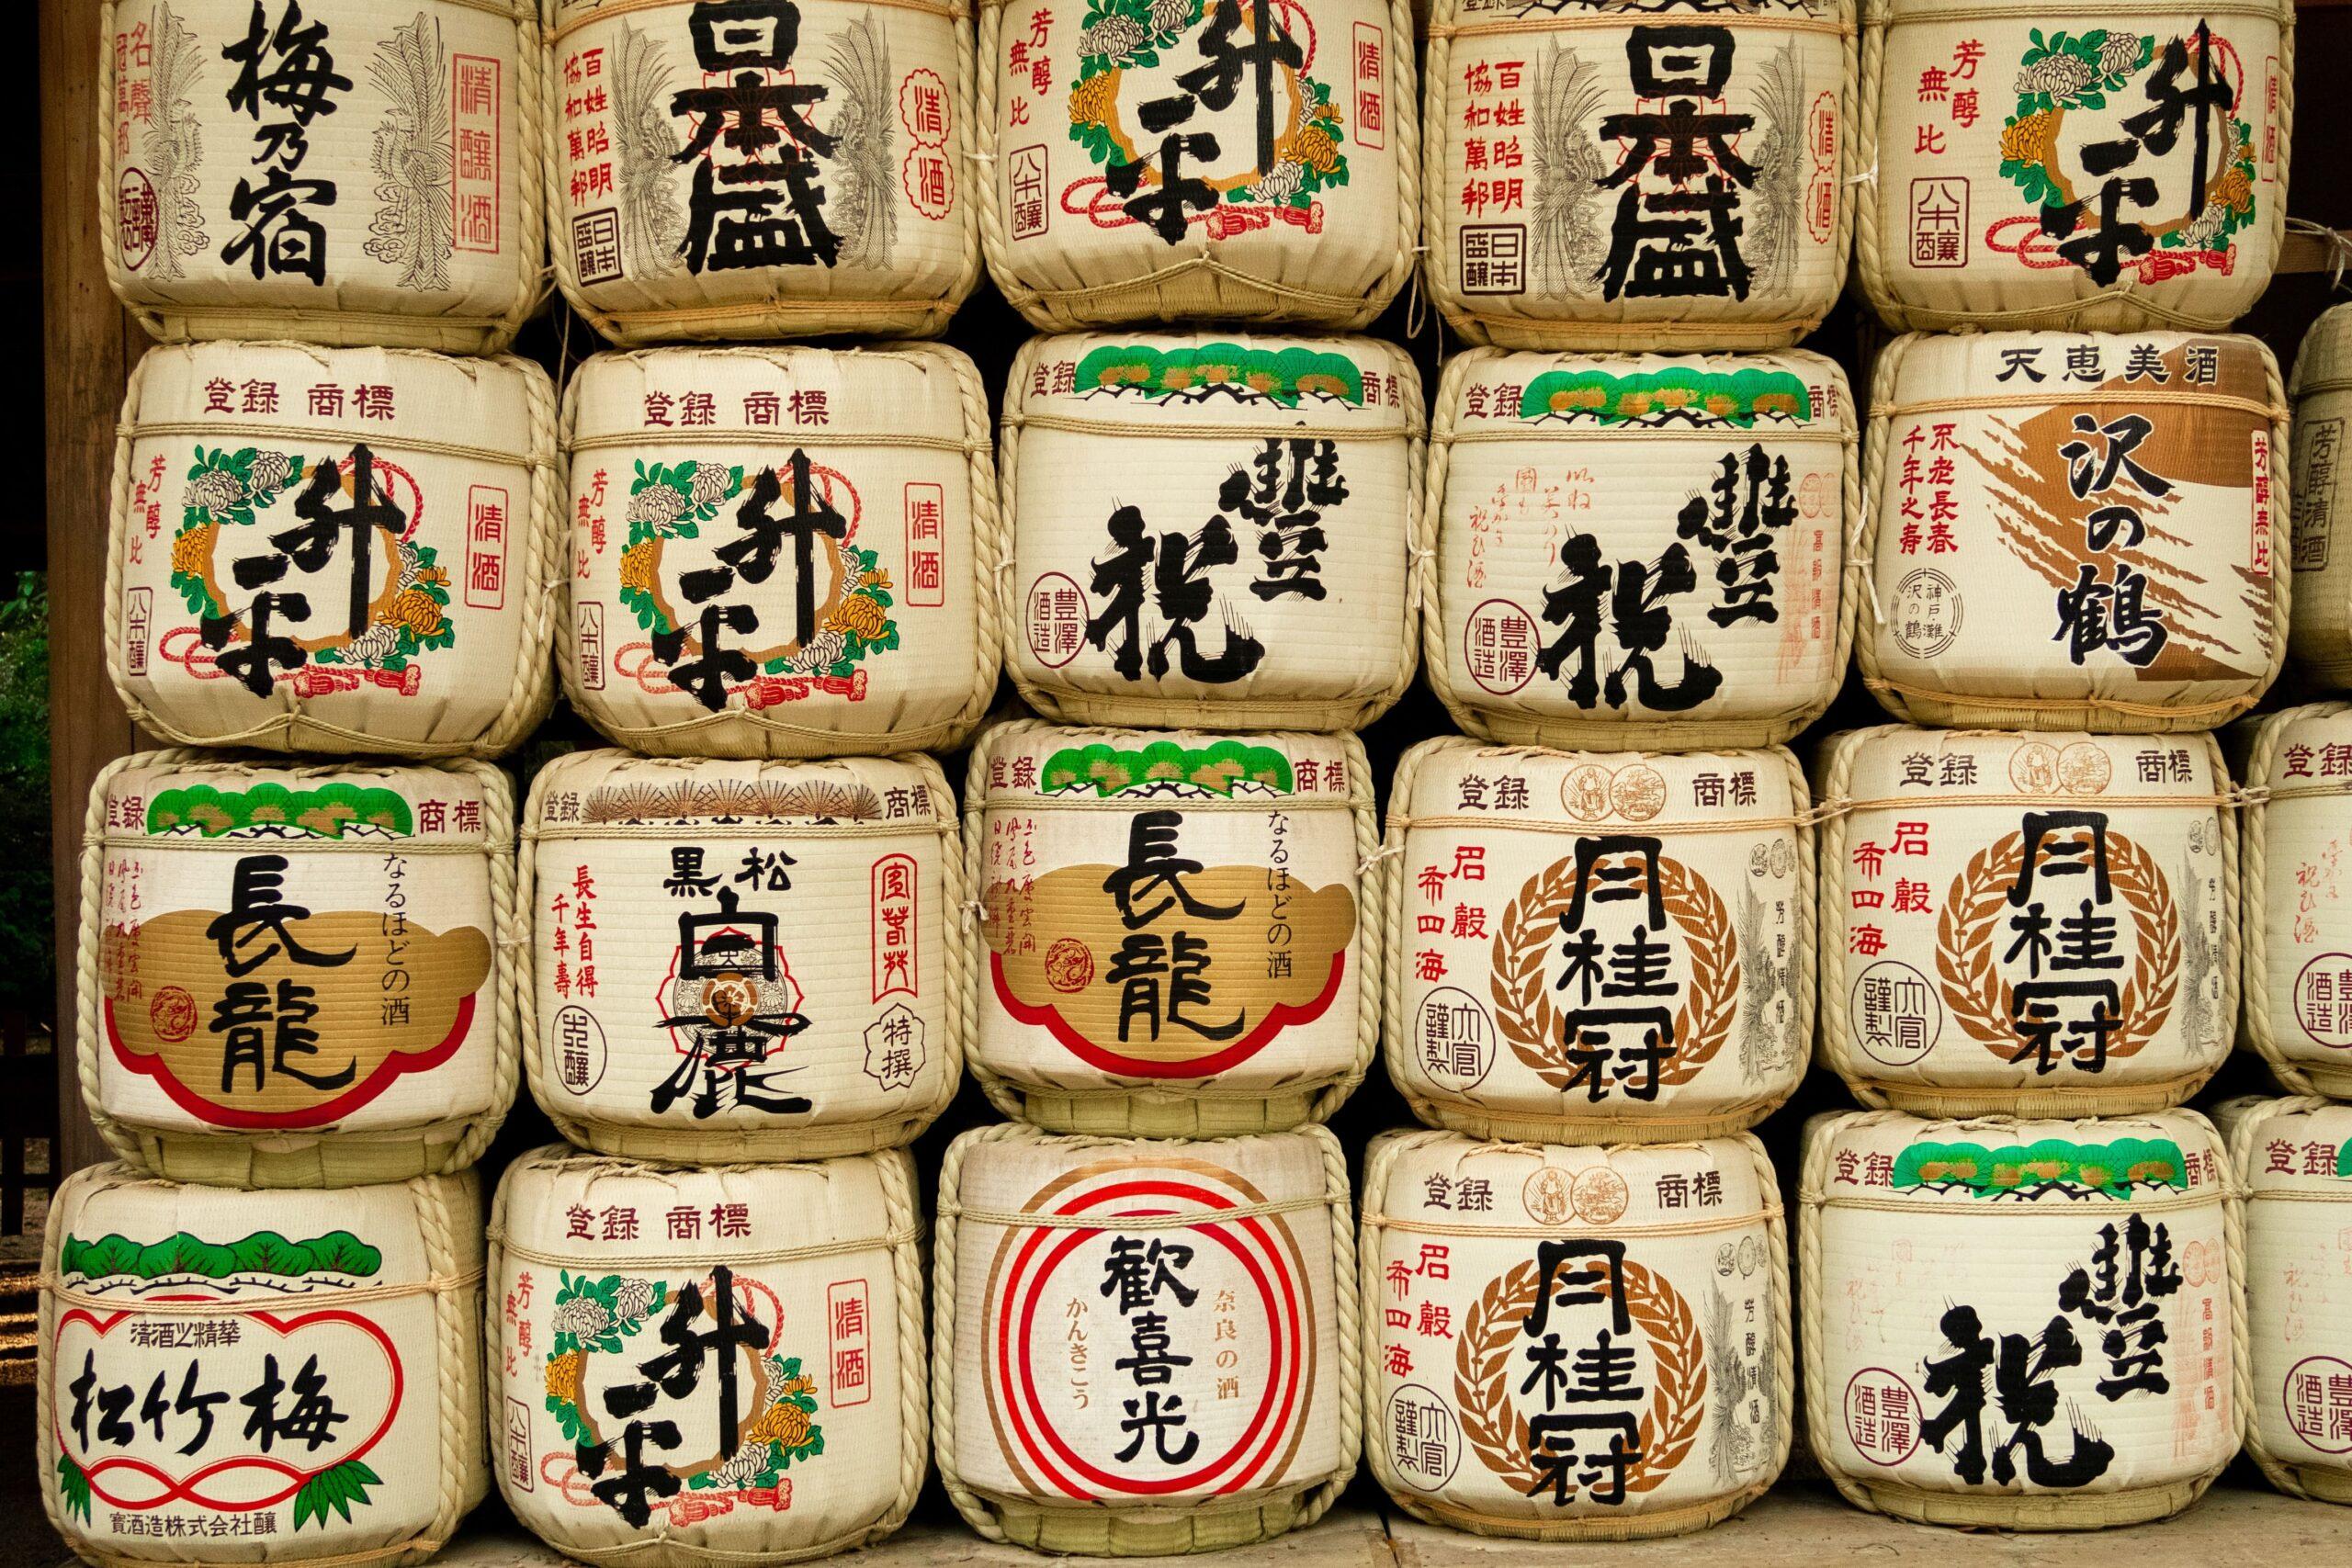 comprar ginebra japonesa